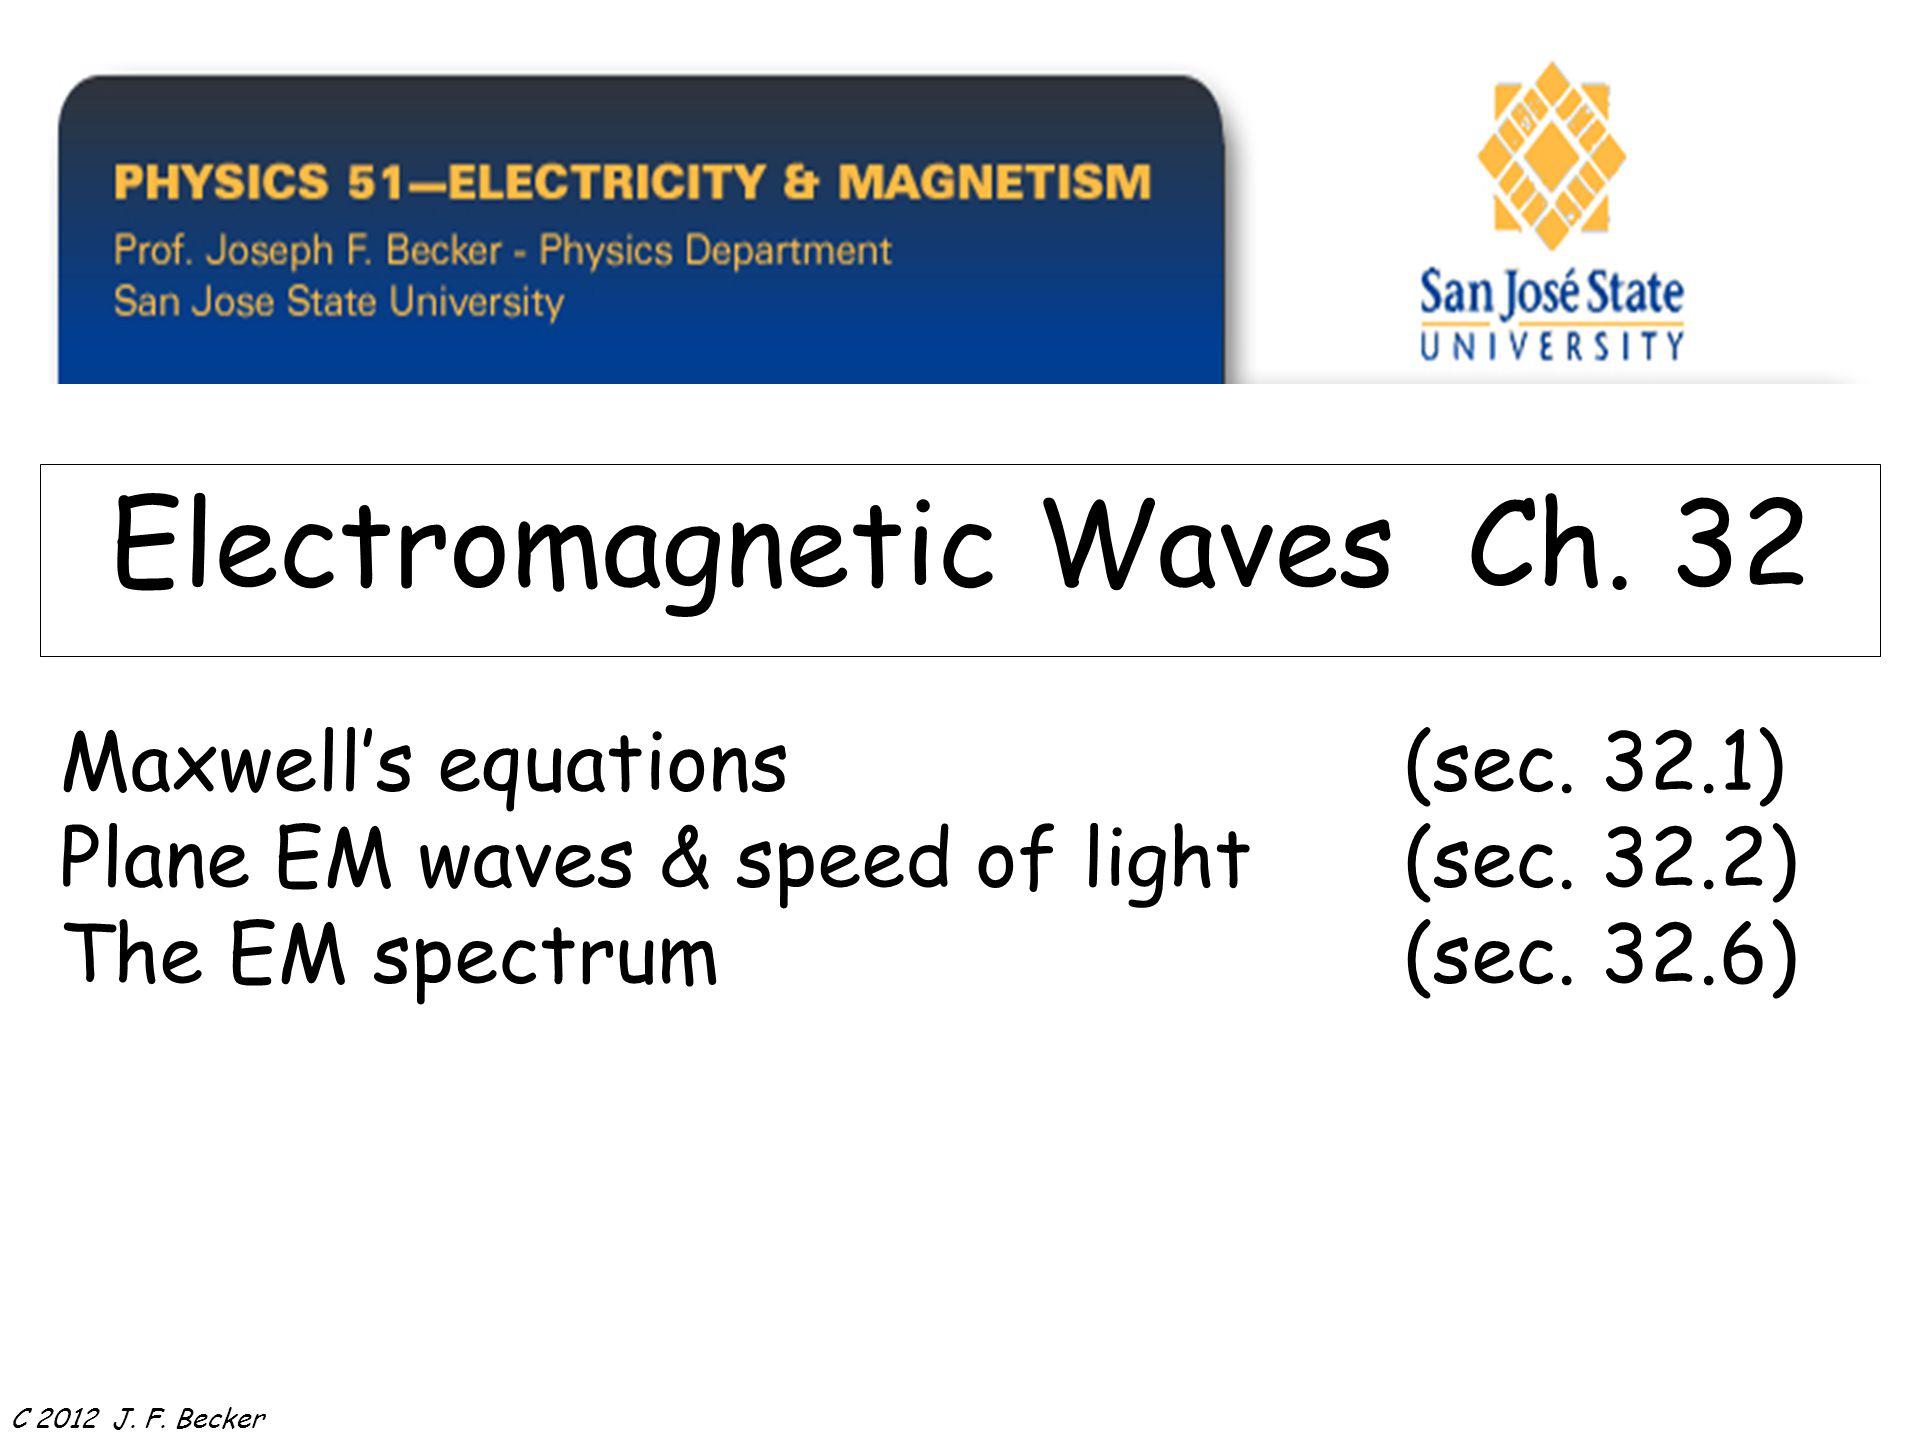 Maxwell's equations(sec. 32.1) Plane EM waves & speed of light(sec.